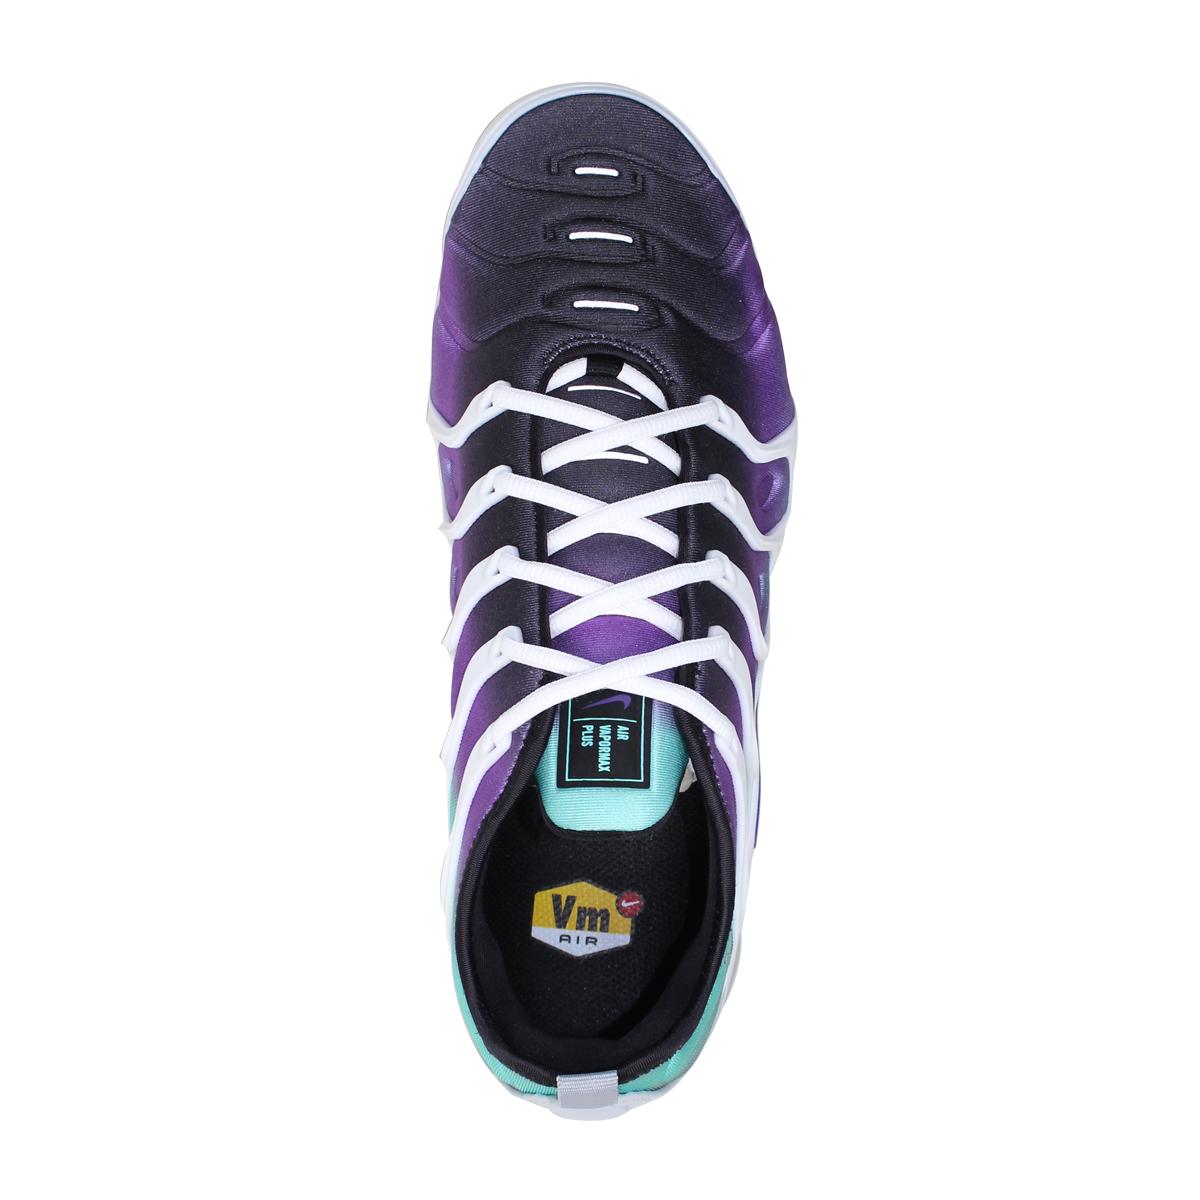 bf9ccf82379 ALLSPORTS  NIKE AIR VAPORMAX PLUS GRAPE Nike vapor max plus sneakers ...